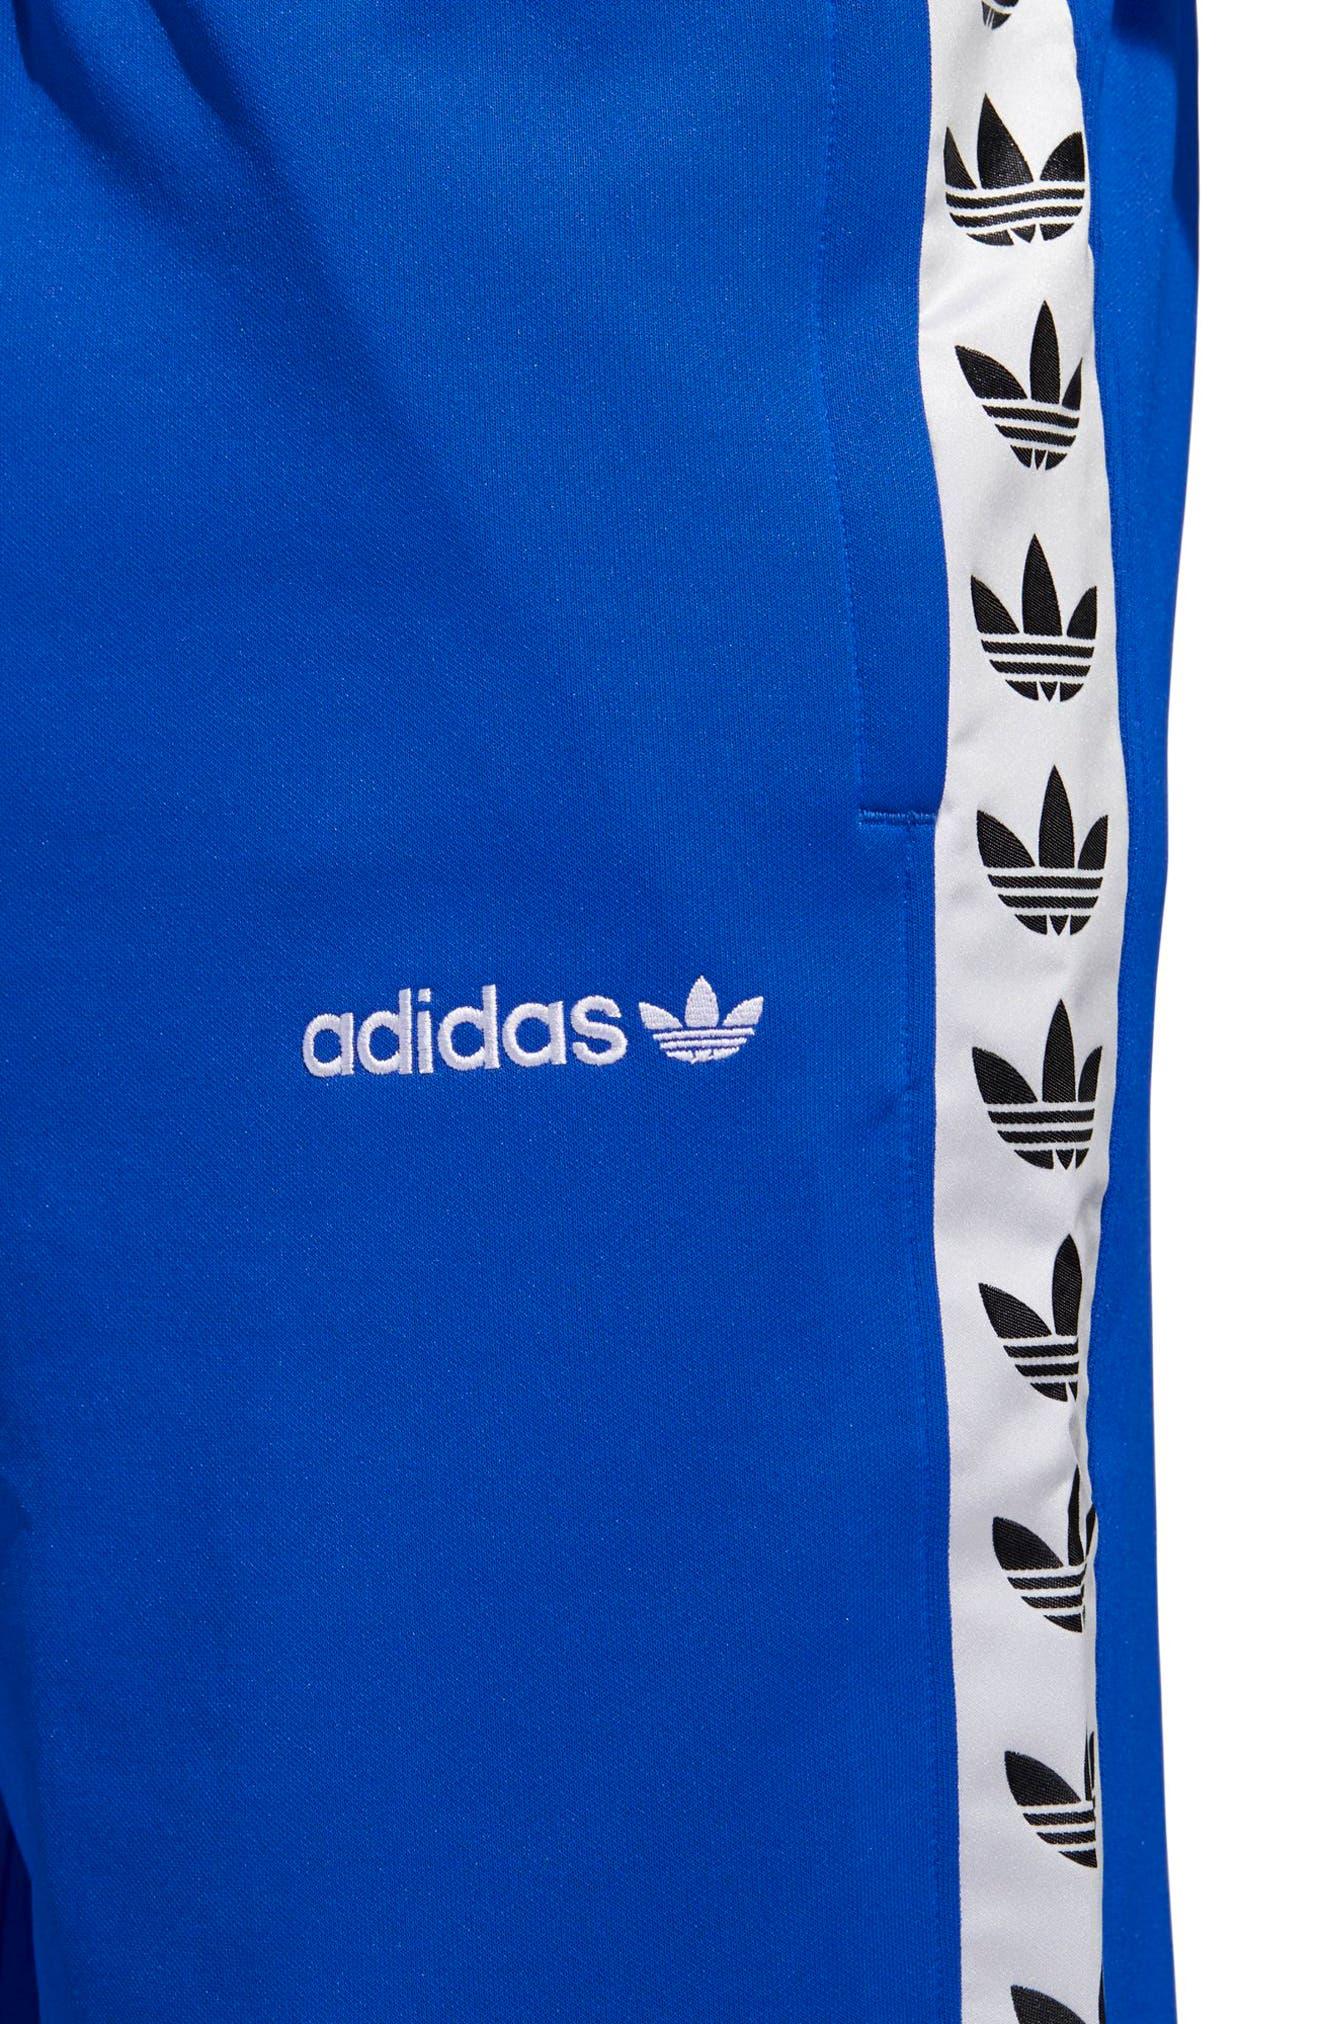 Originals TNT Shorts,                             Alternate thumbnail 4, color,                             Bold Blue